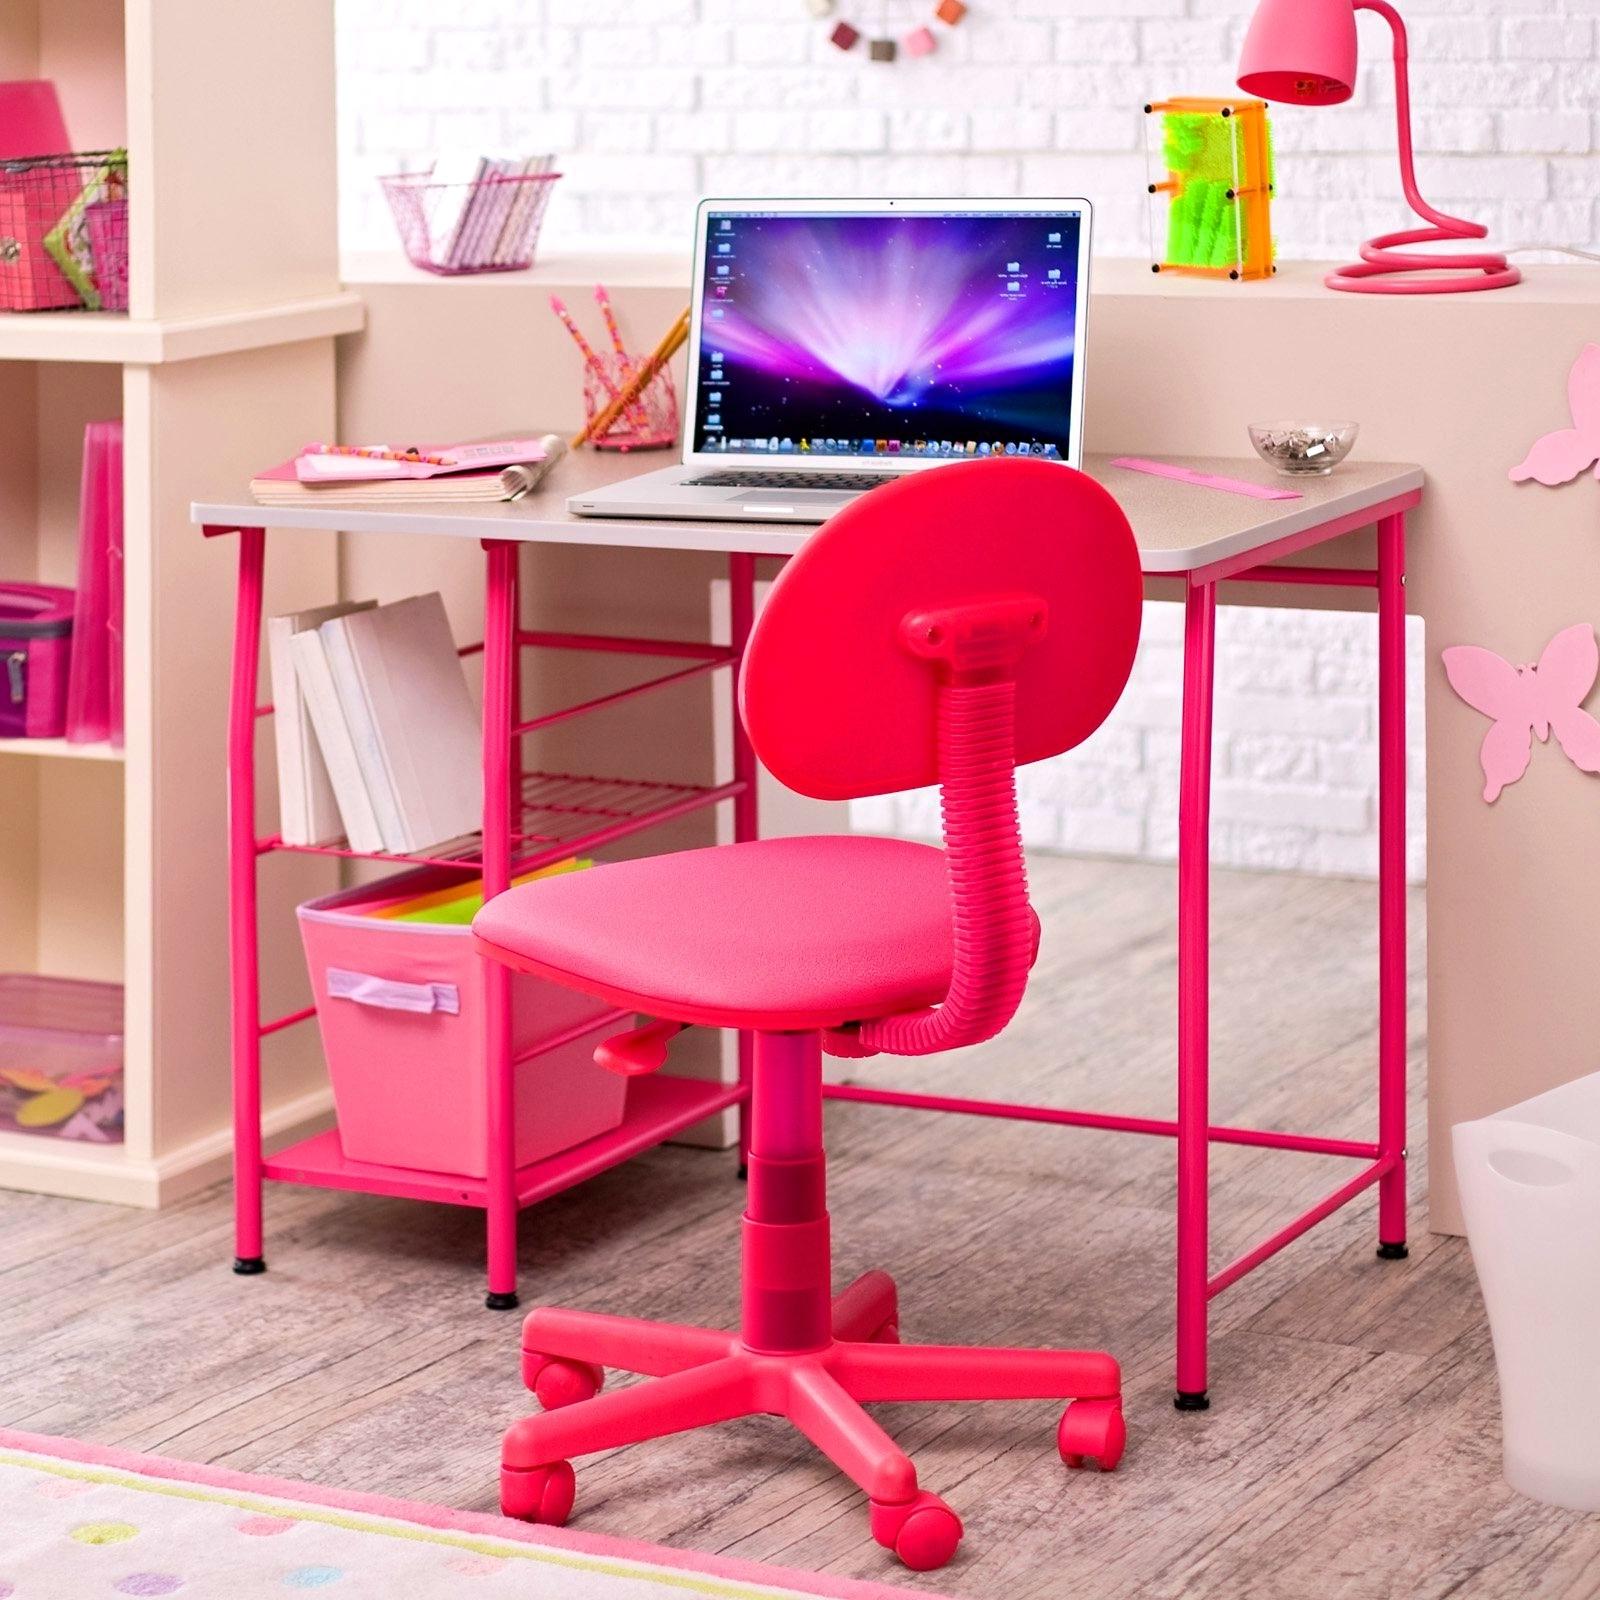 Preferred Pink Computer Desks Throughout Top 74 Wicked Pink Childrens Desk Kids Work Girls Chair White Teen (View 15 of 20)